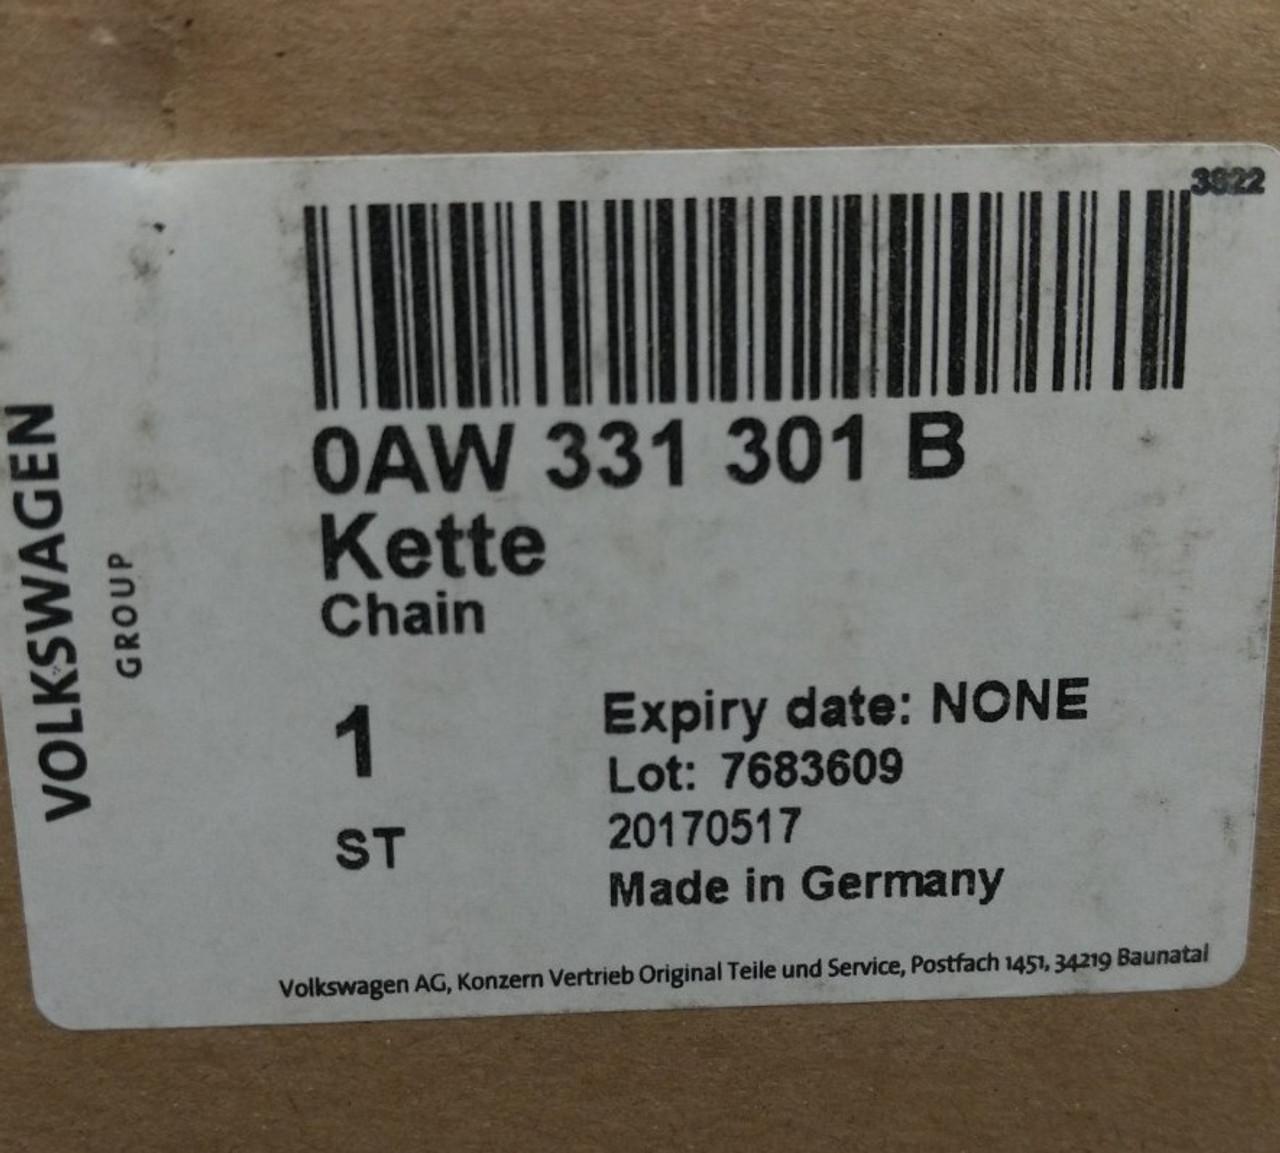 CVT Chain  Audi   OAW 8speed transmission